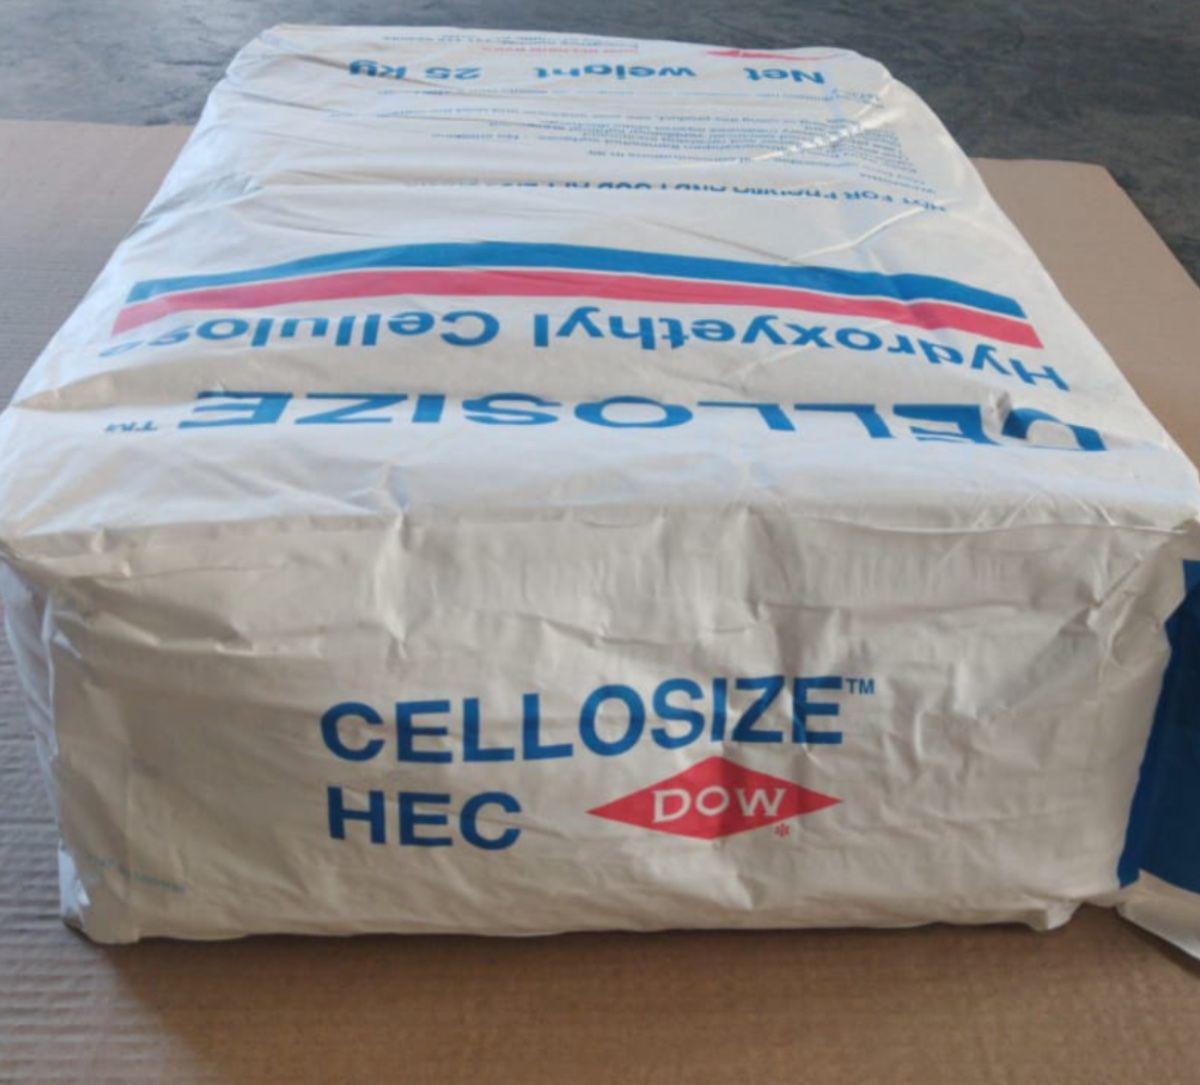 Espessante Cellosize QP 100 Dow Substituto Carbopol 940 5kg